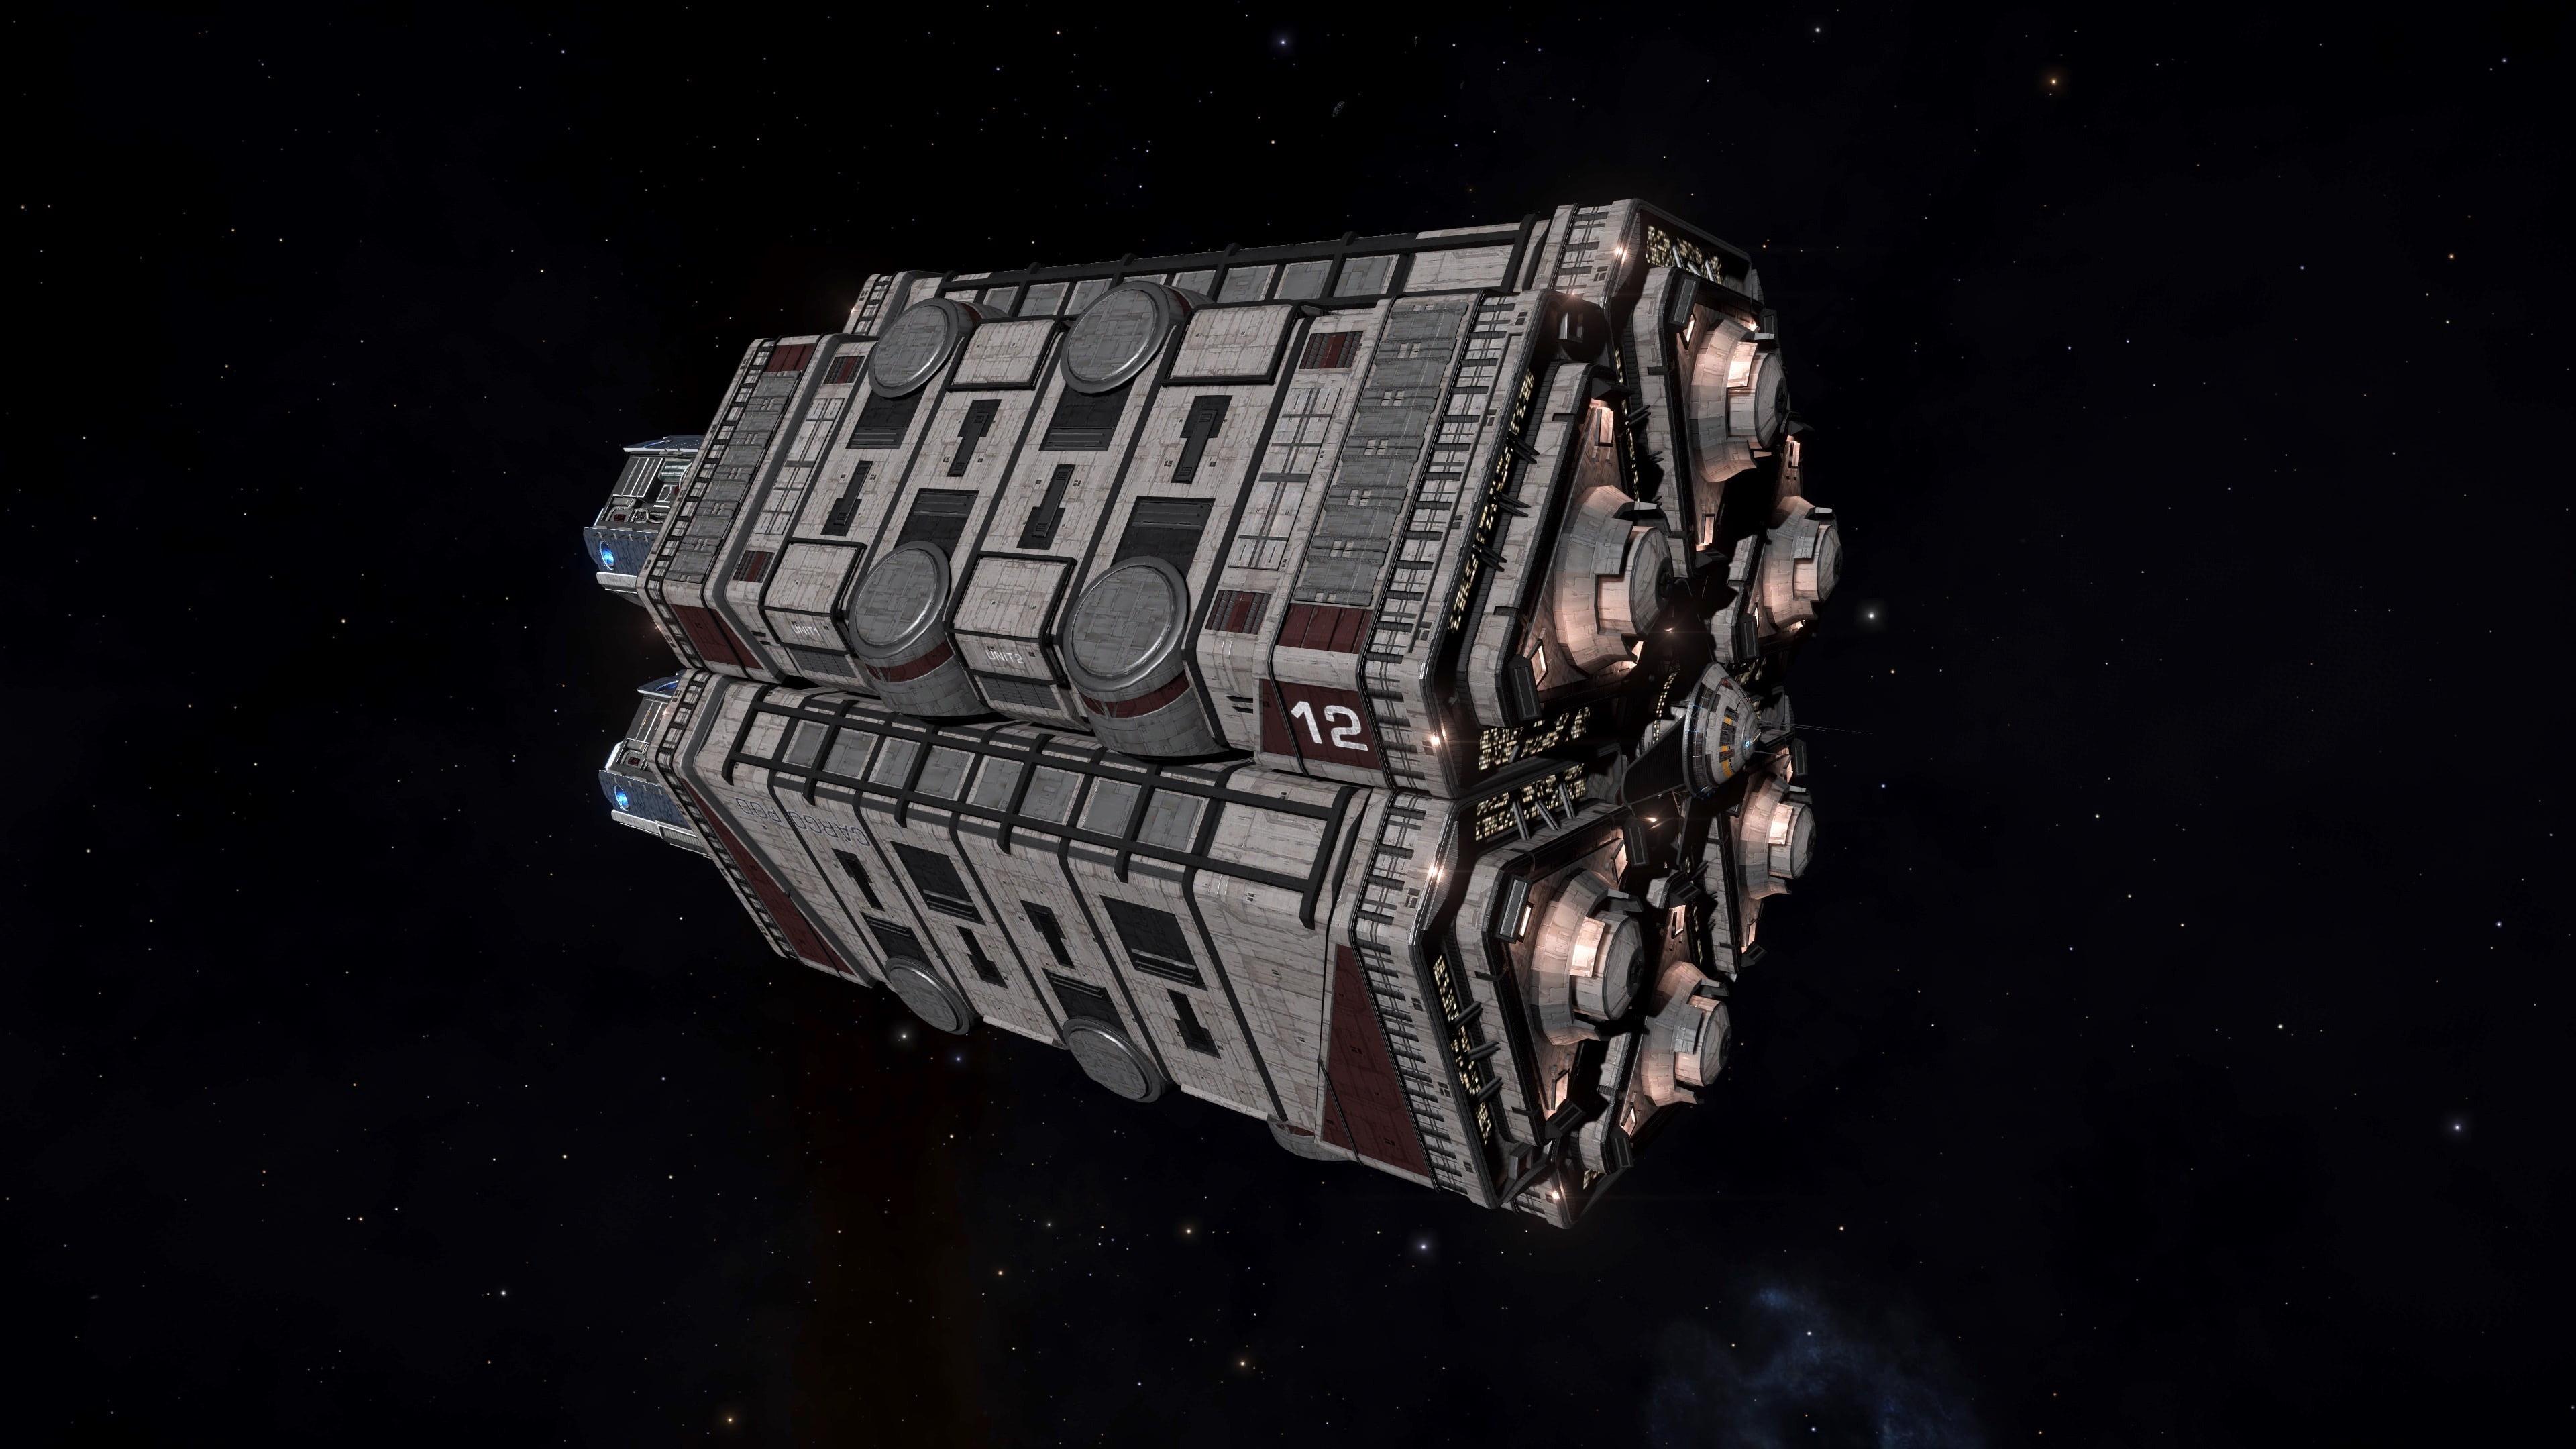 Hercules Class Bulk Cargo Ship TFD-013